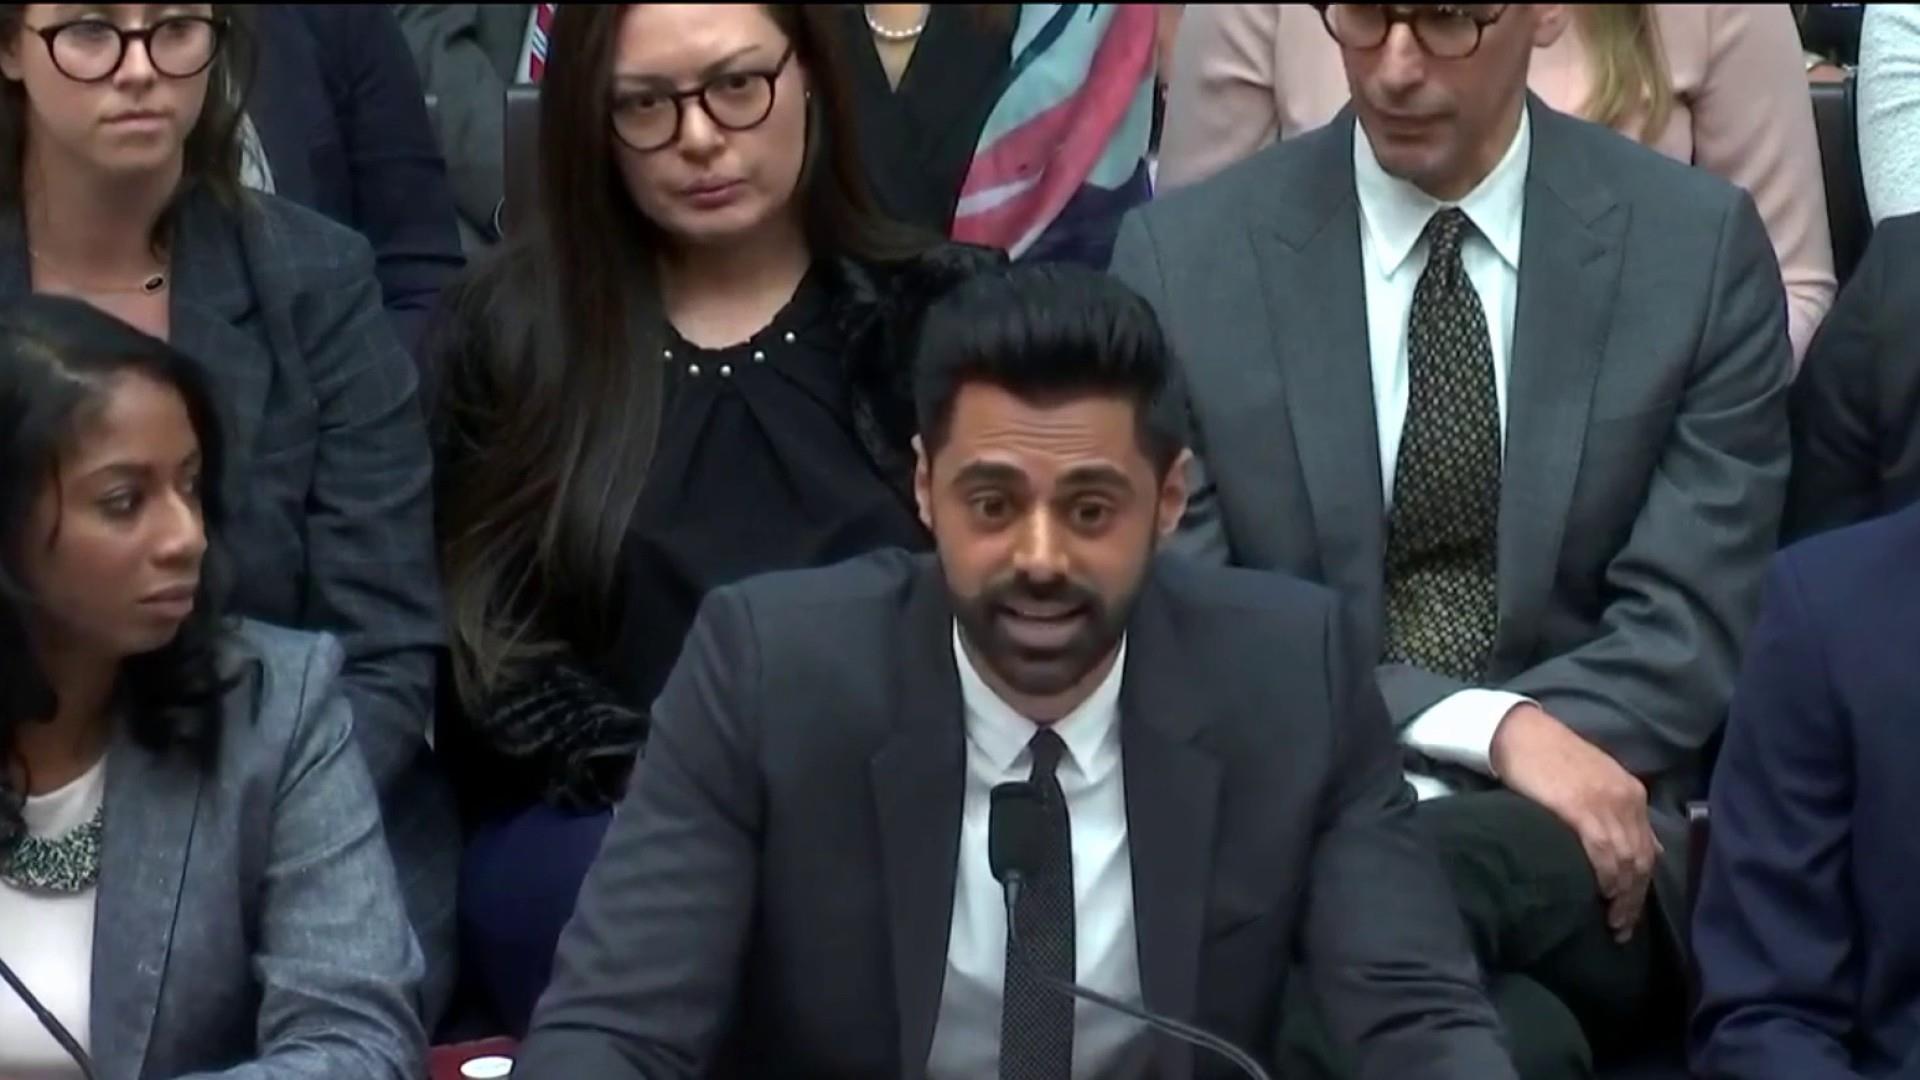 Comedian Hasan Minhaj testifies before Congress